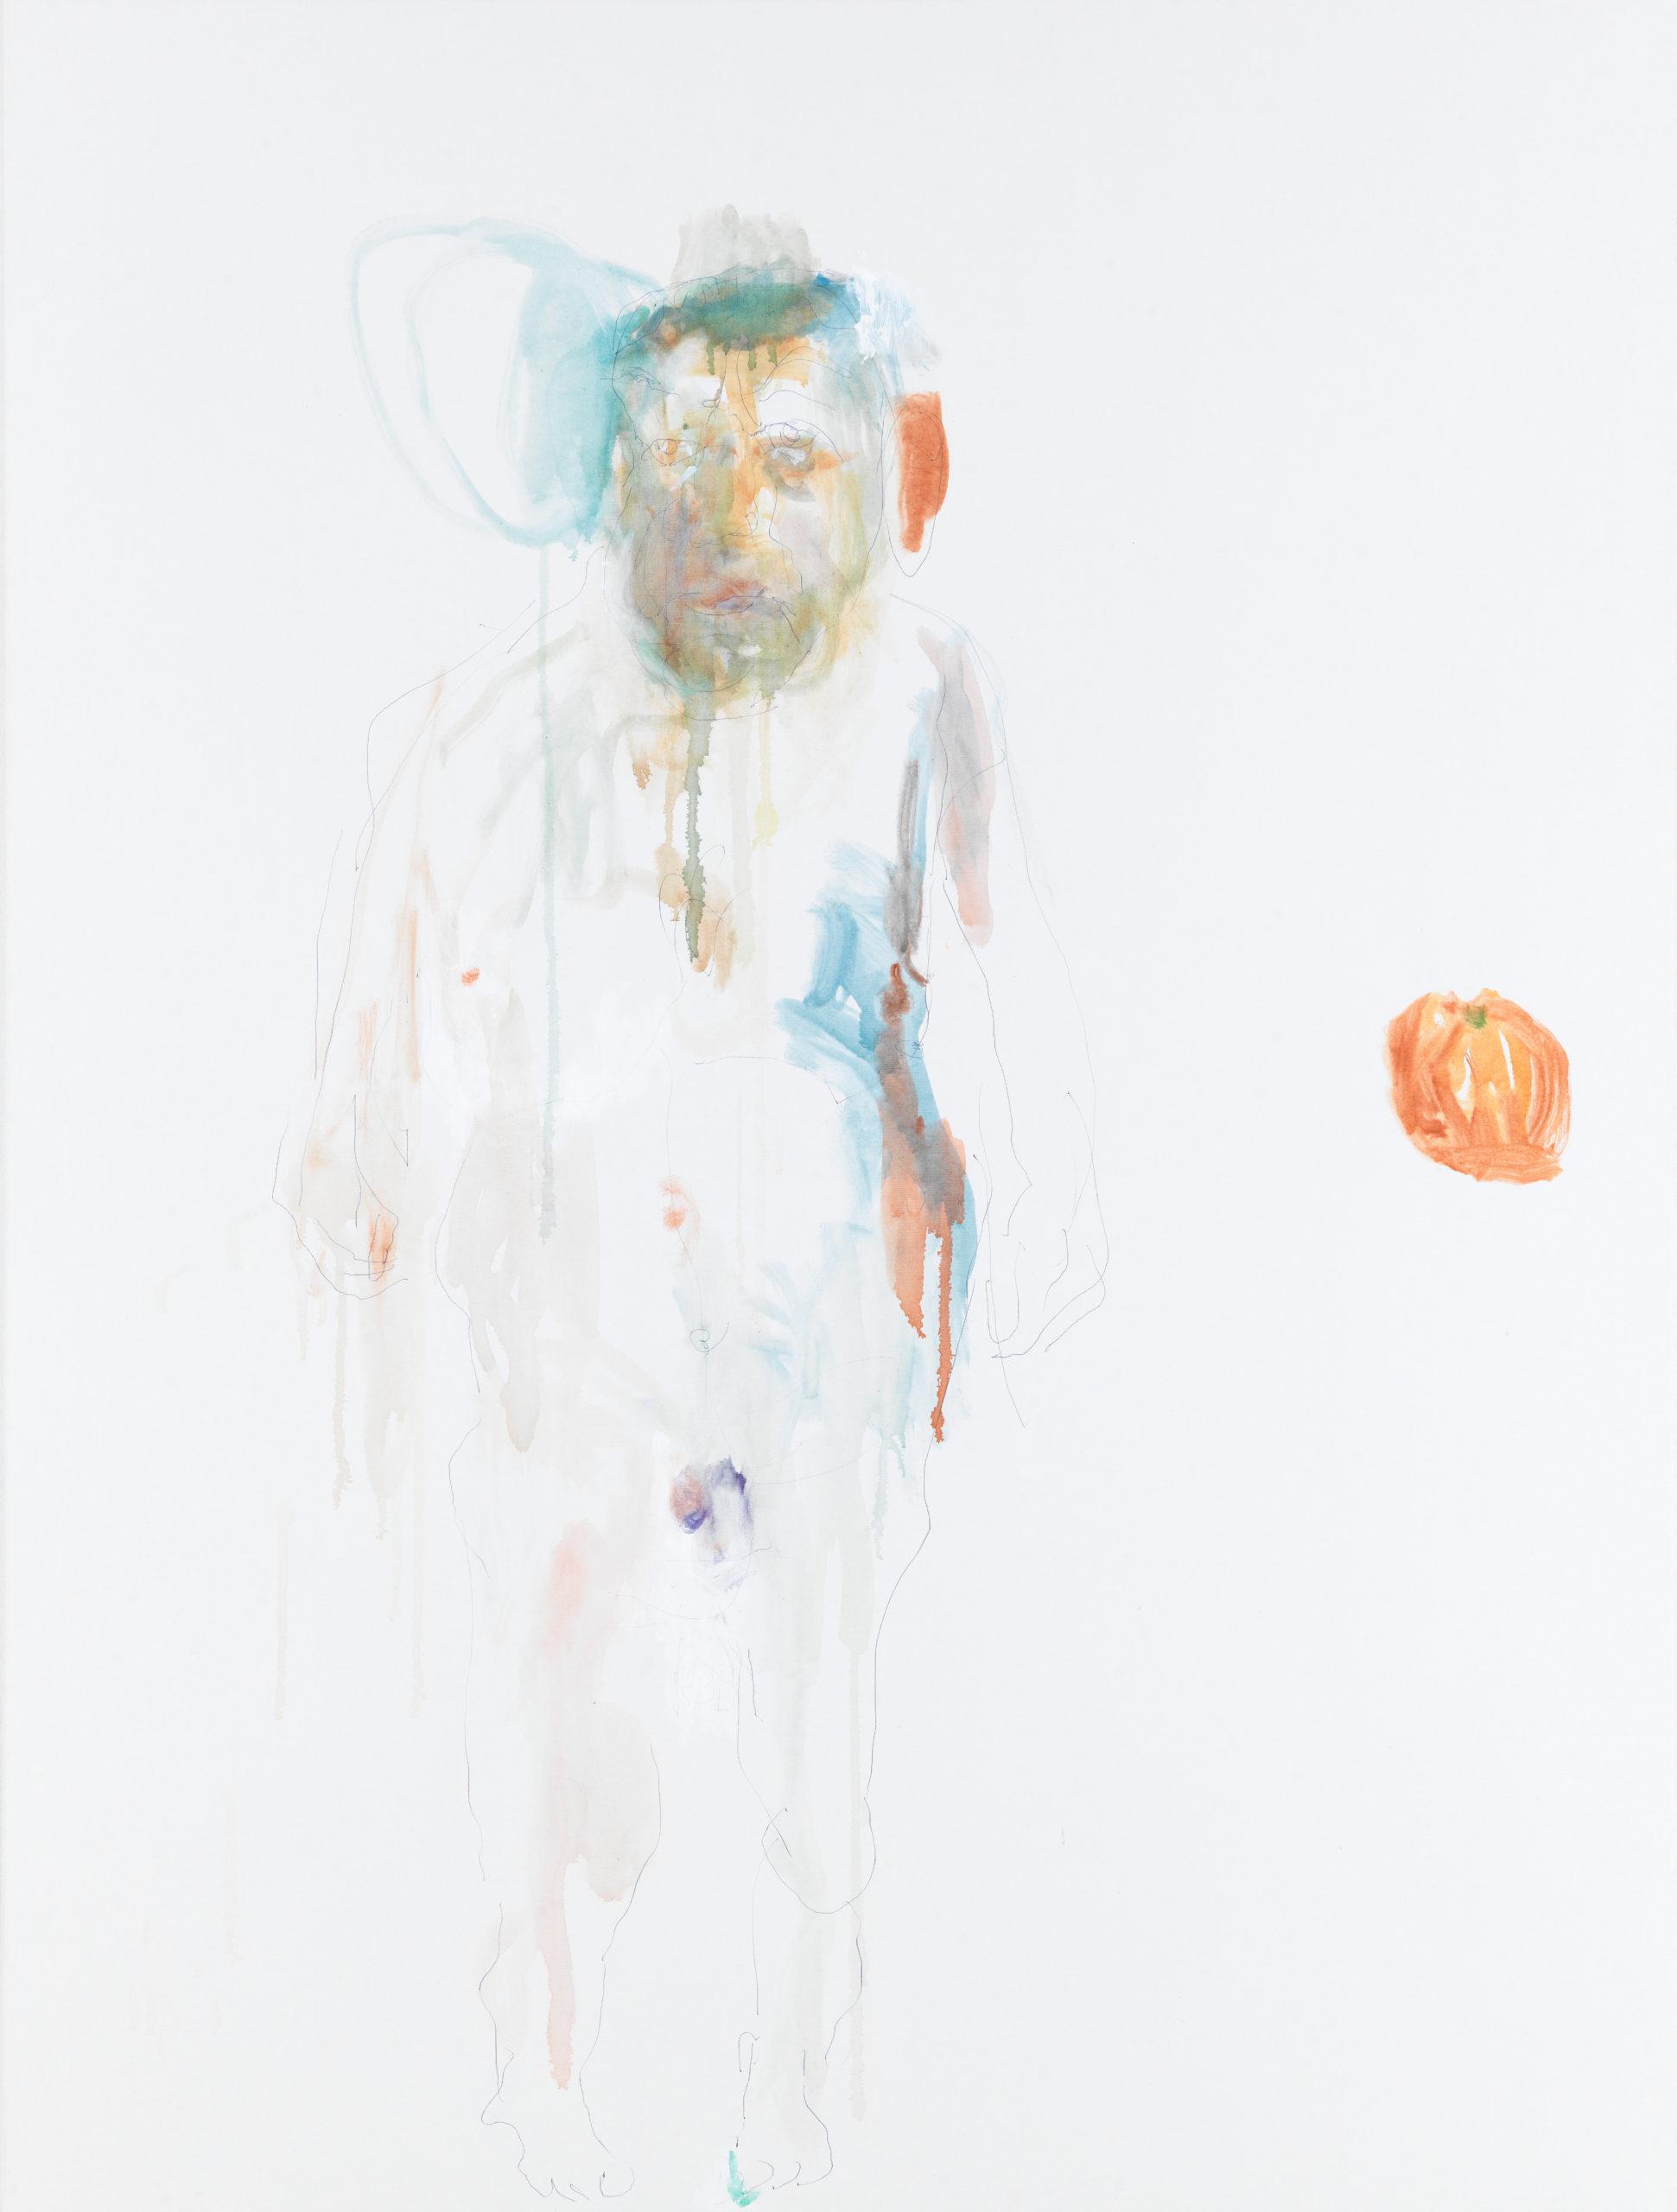 Reinhard Pods, Ohne Titel (selbst), 2021, Kugelschreiber, Aquarell auf Leinwand, 170 x 129,8 cm